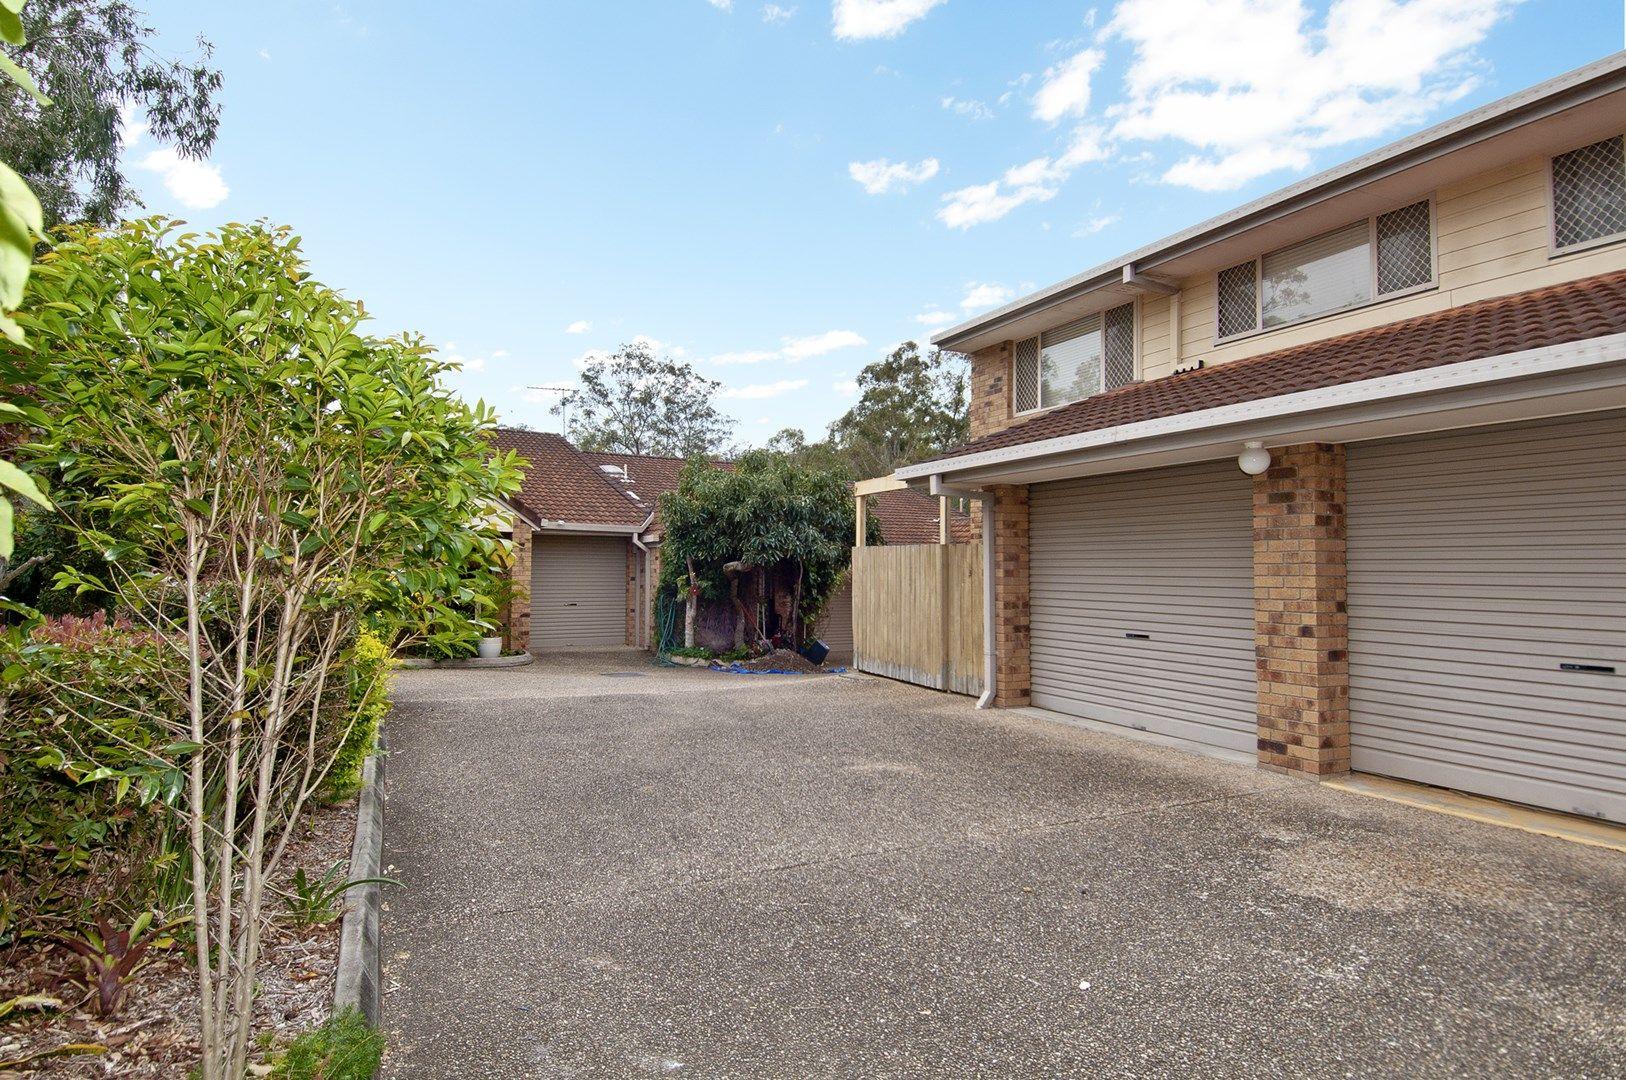 3/406 Chatswood Rd, Shailer Park QLD 4128, Image 0